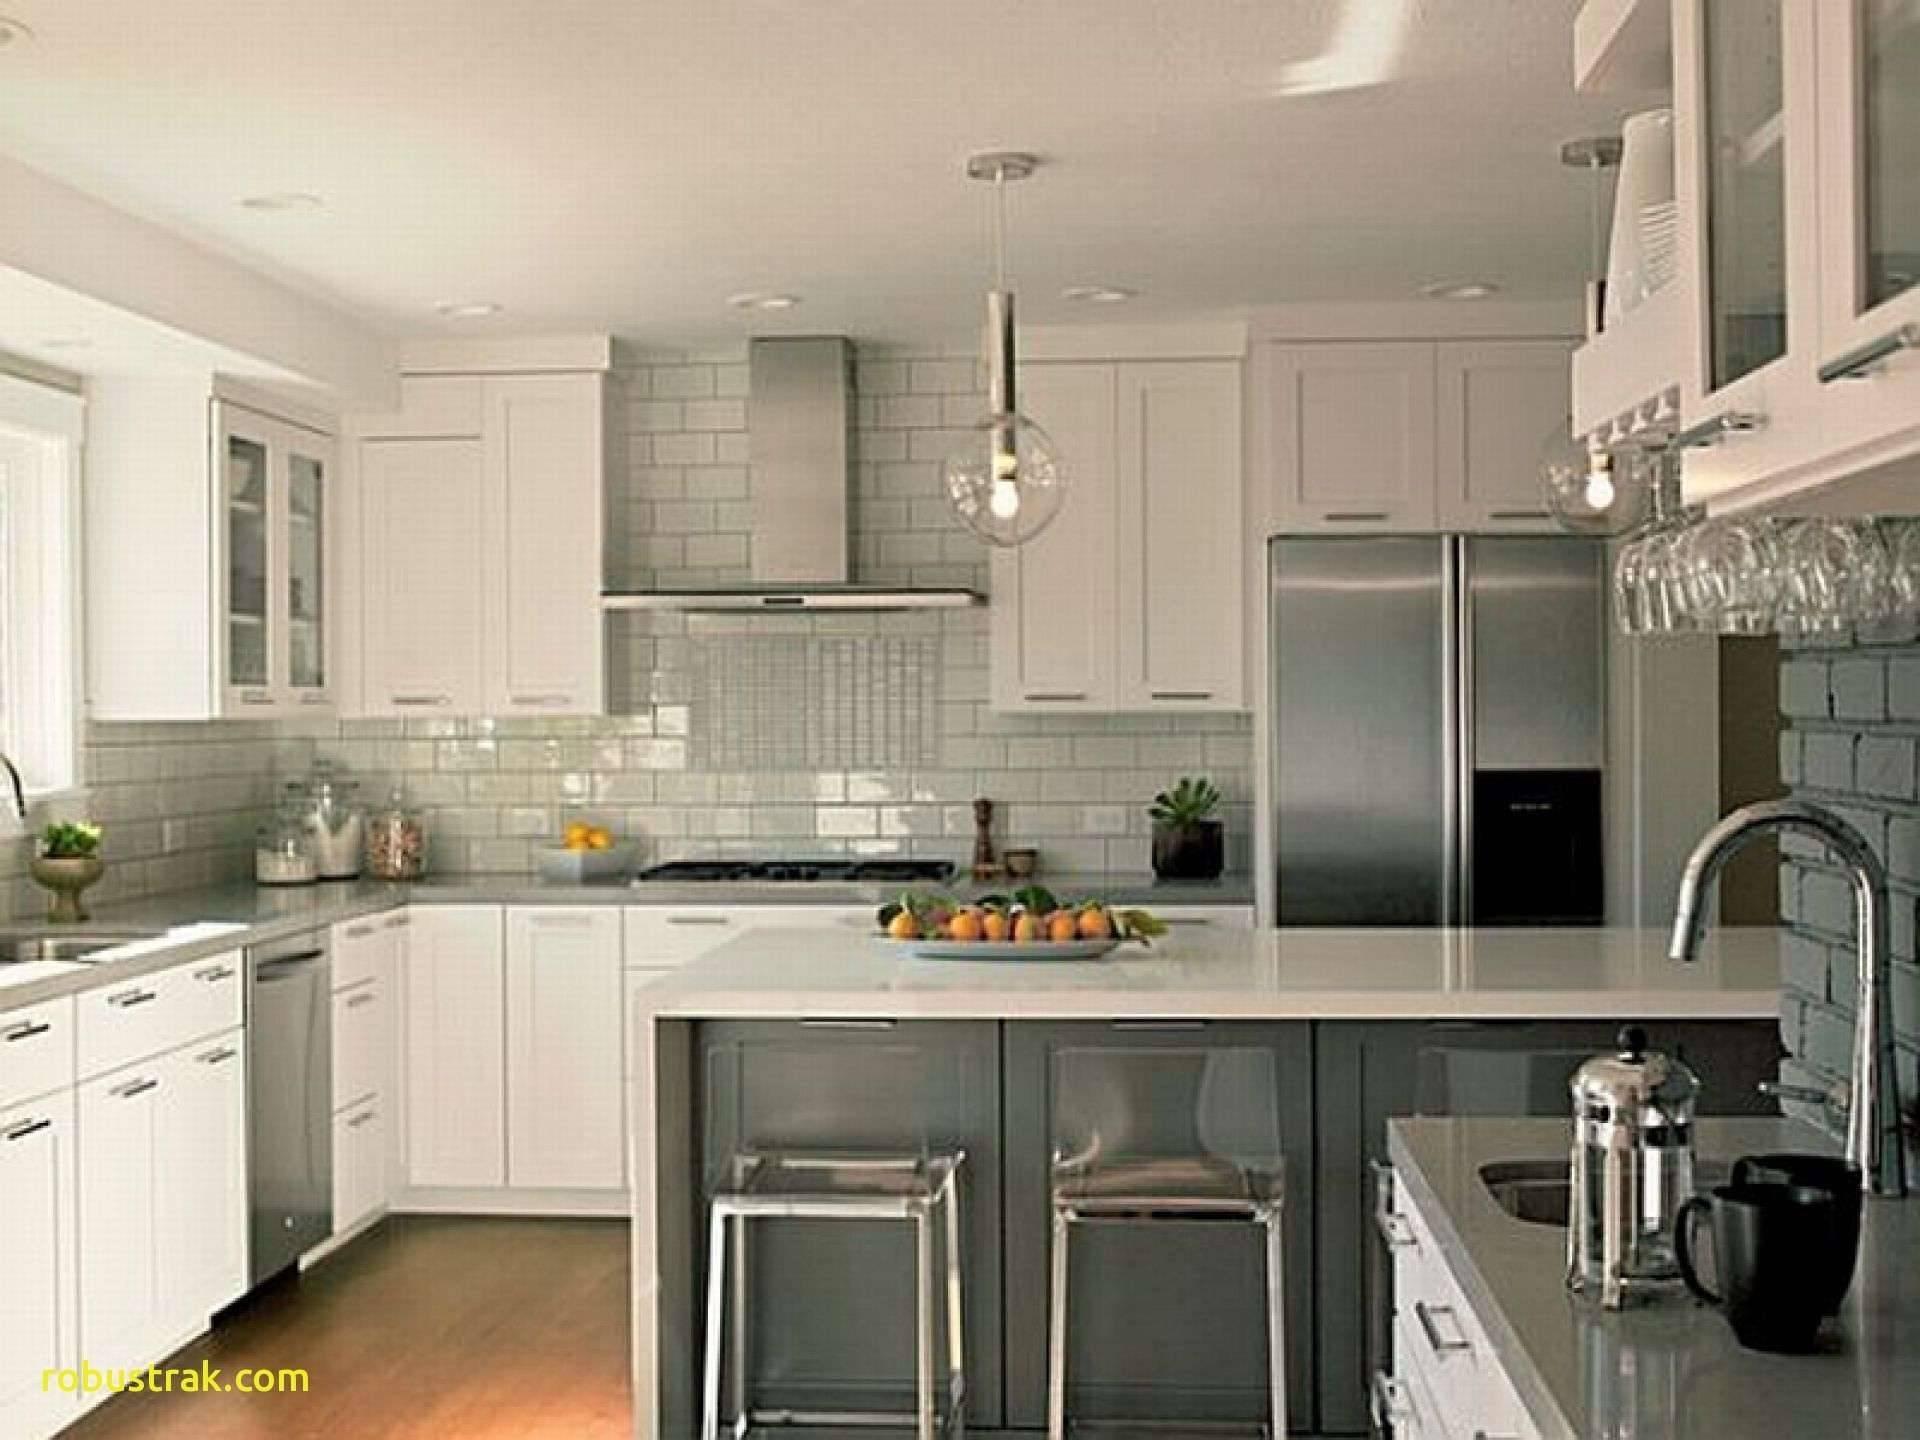 white kitchen ideas on pinterest 3 design kitchen world upbeat therefore white kitchen ideas